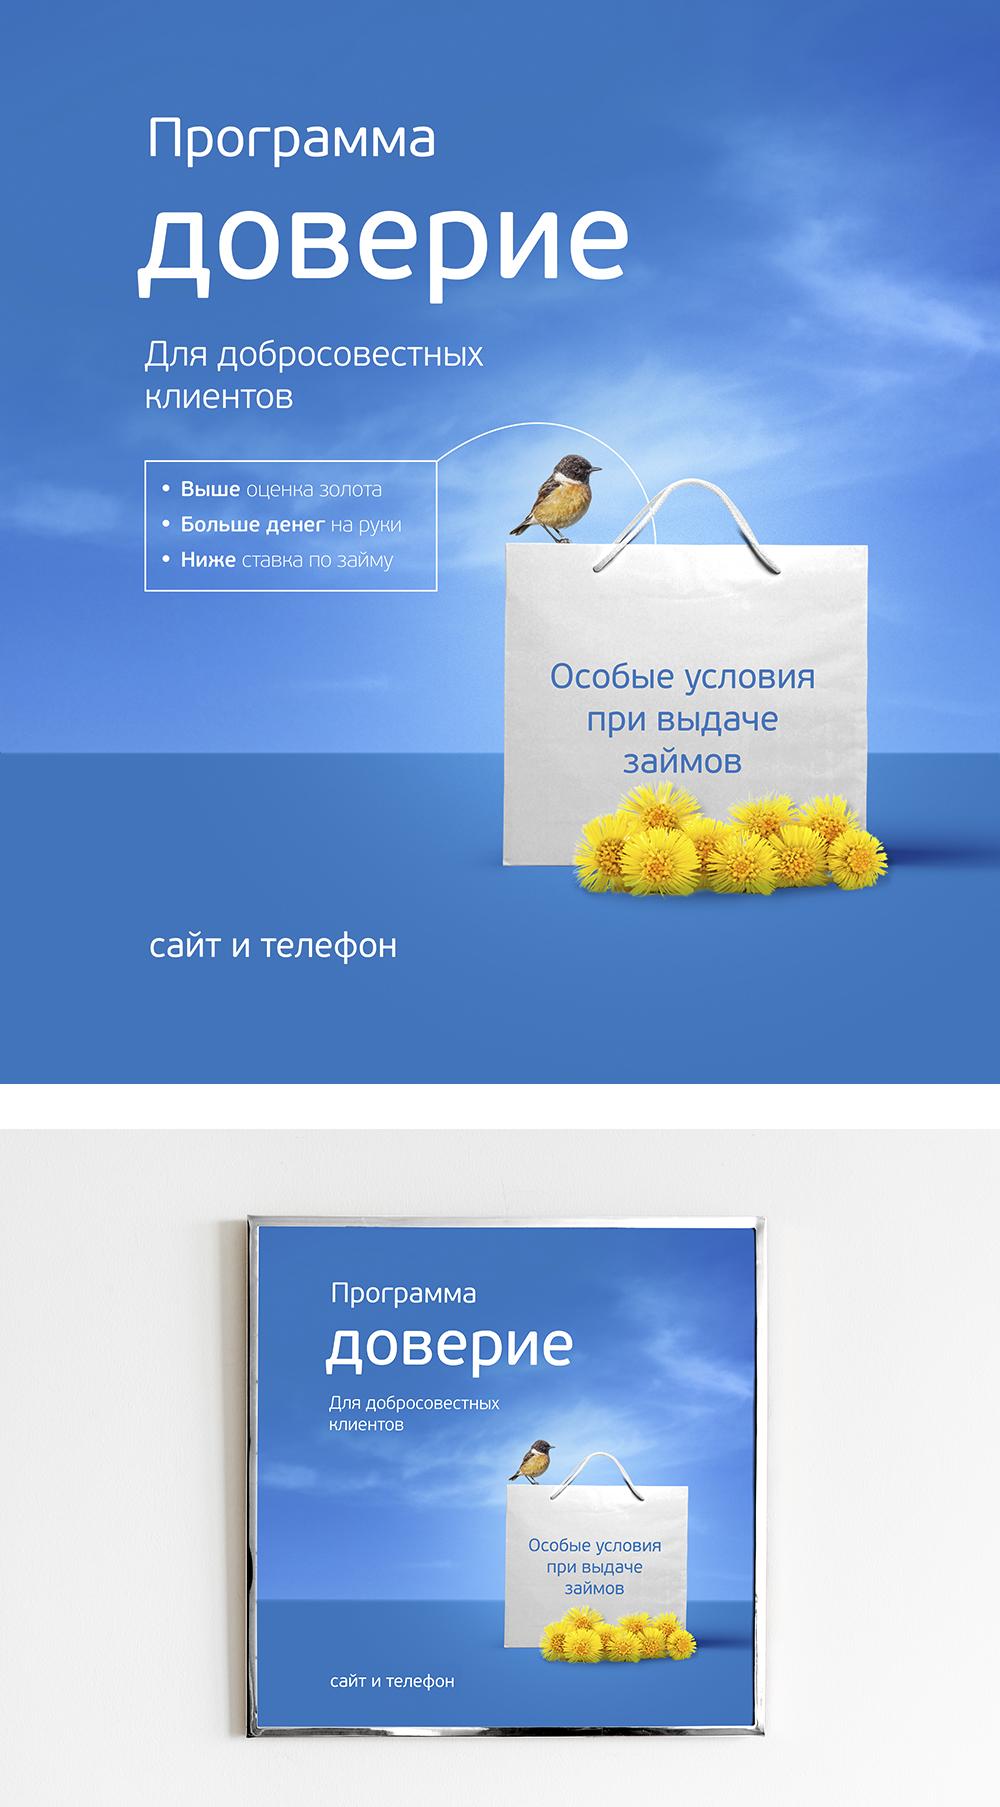 Дизайн плаката по программе лояльности ломбарда фото f_9695c62d4a470bcb.jpg